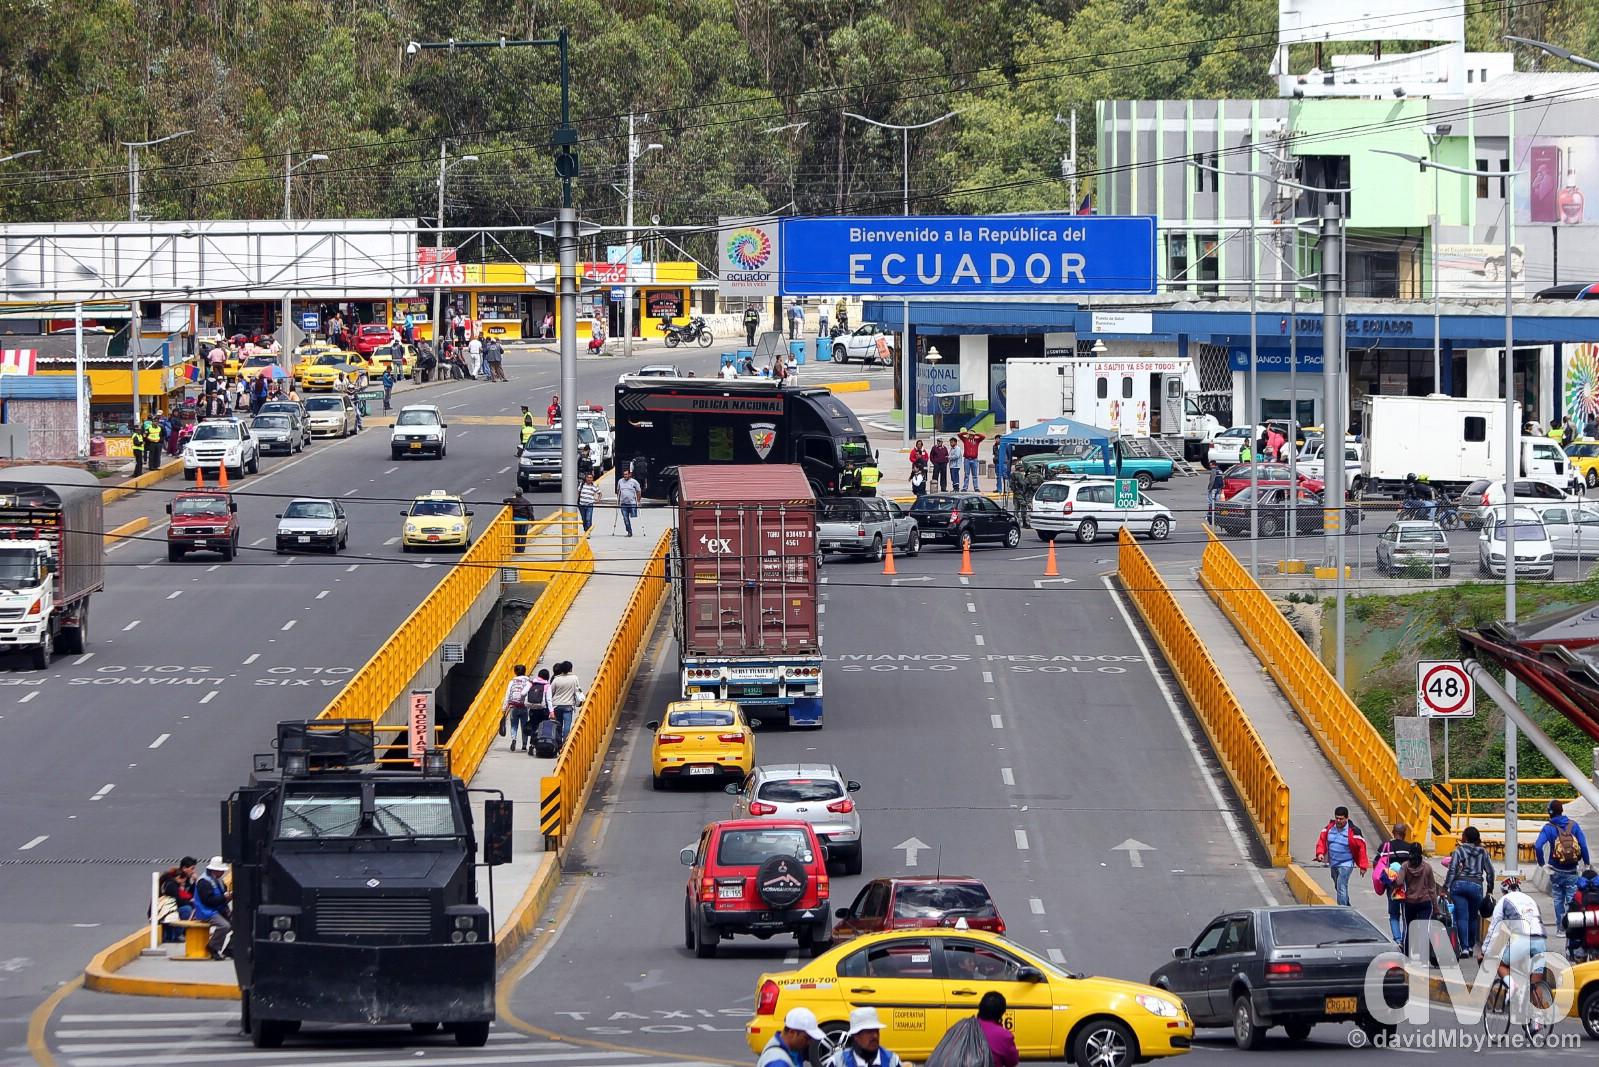 Leaving Colombia. Ecuador as seen across the Colombian side of the Rumichaca bridge marking the Colombia/Ecuador border. July 2, 2015.